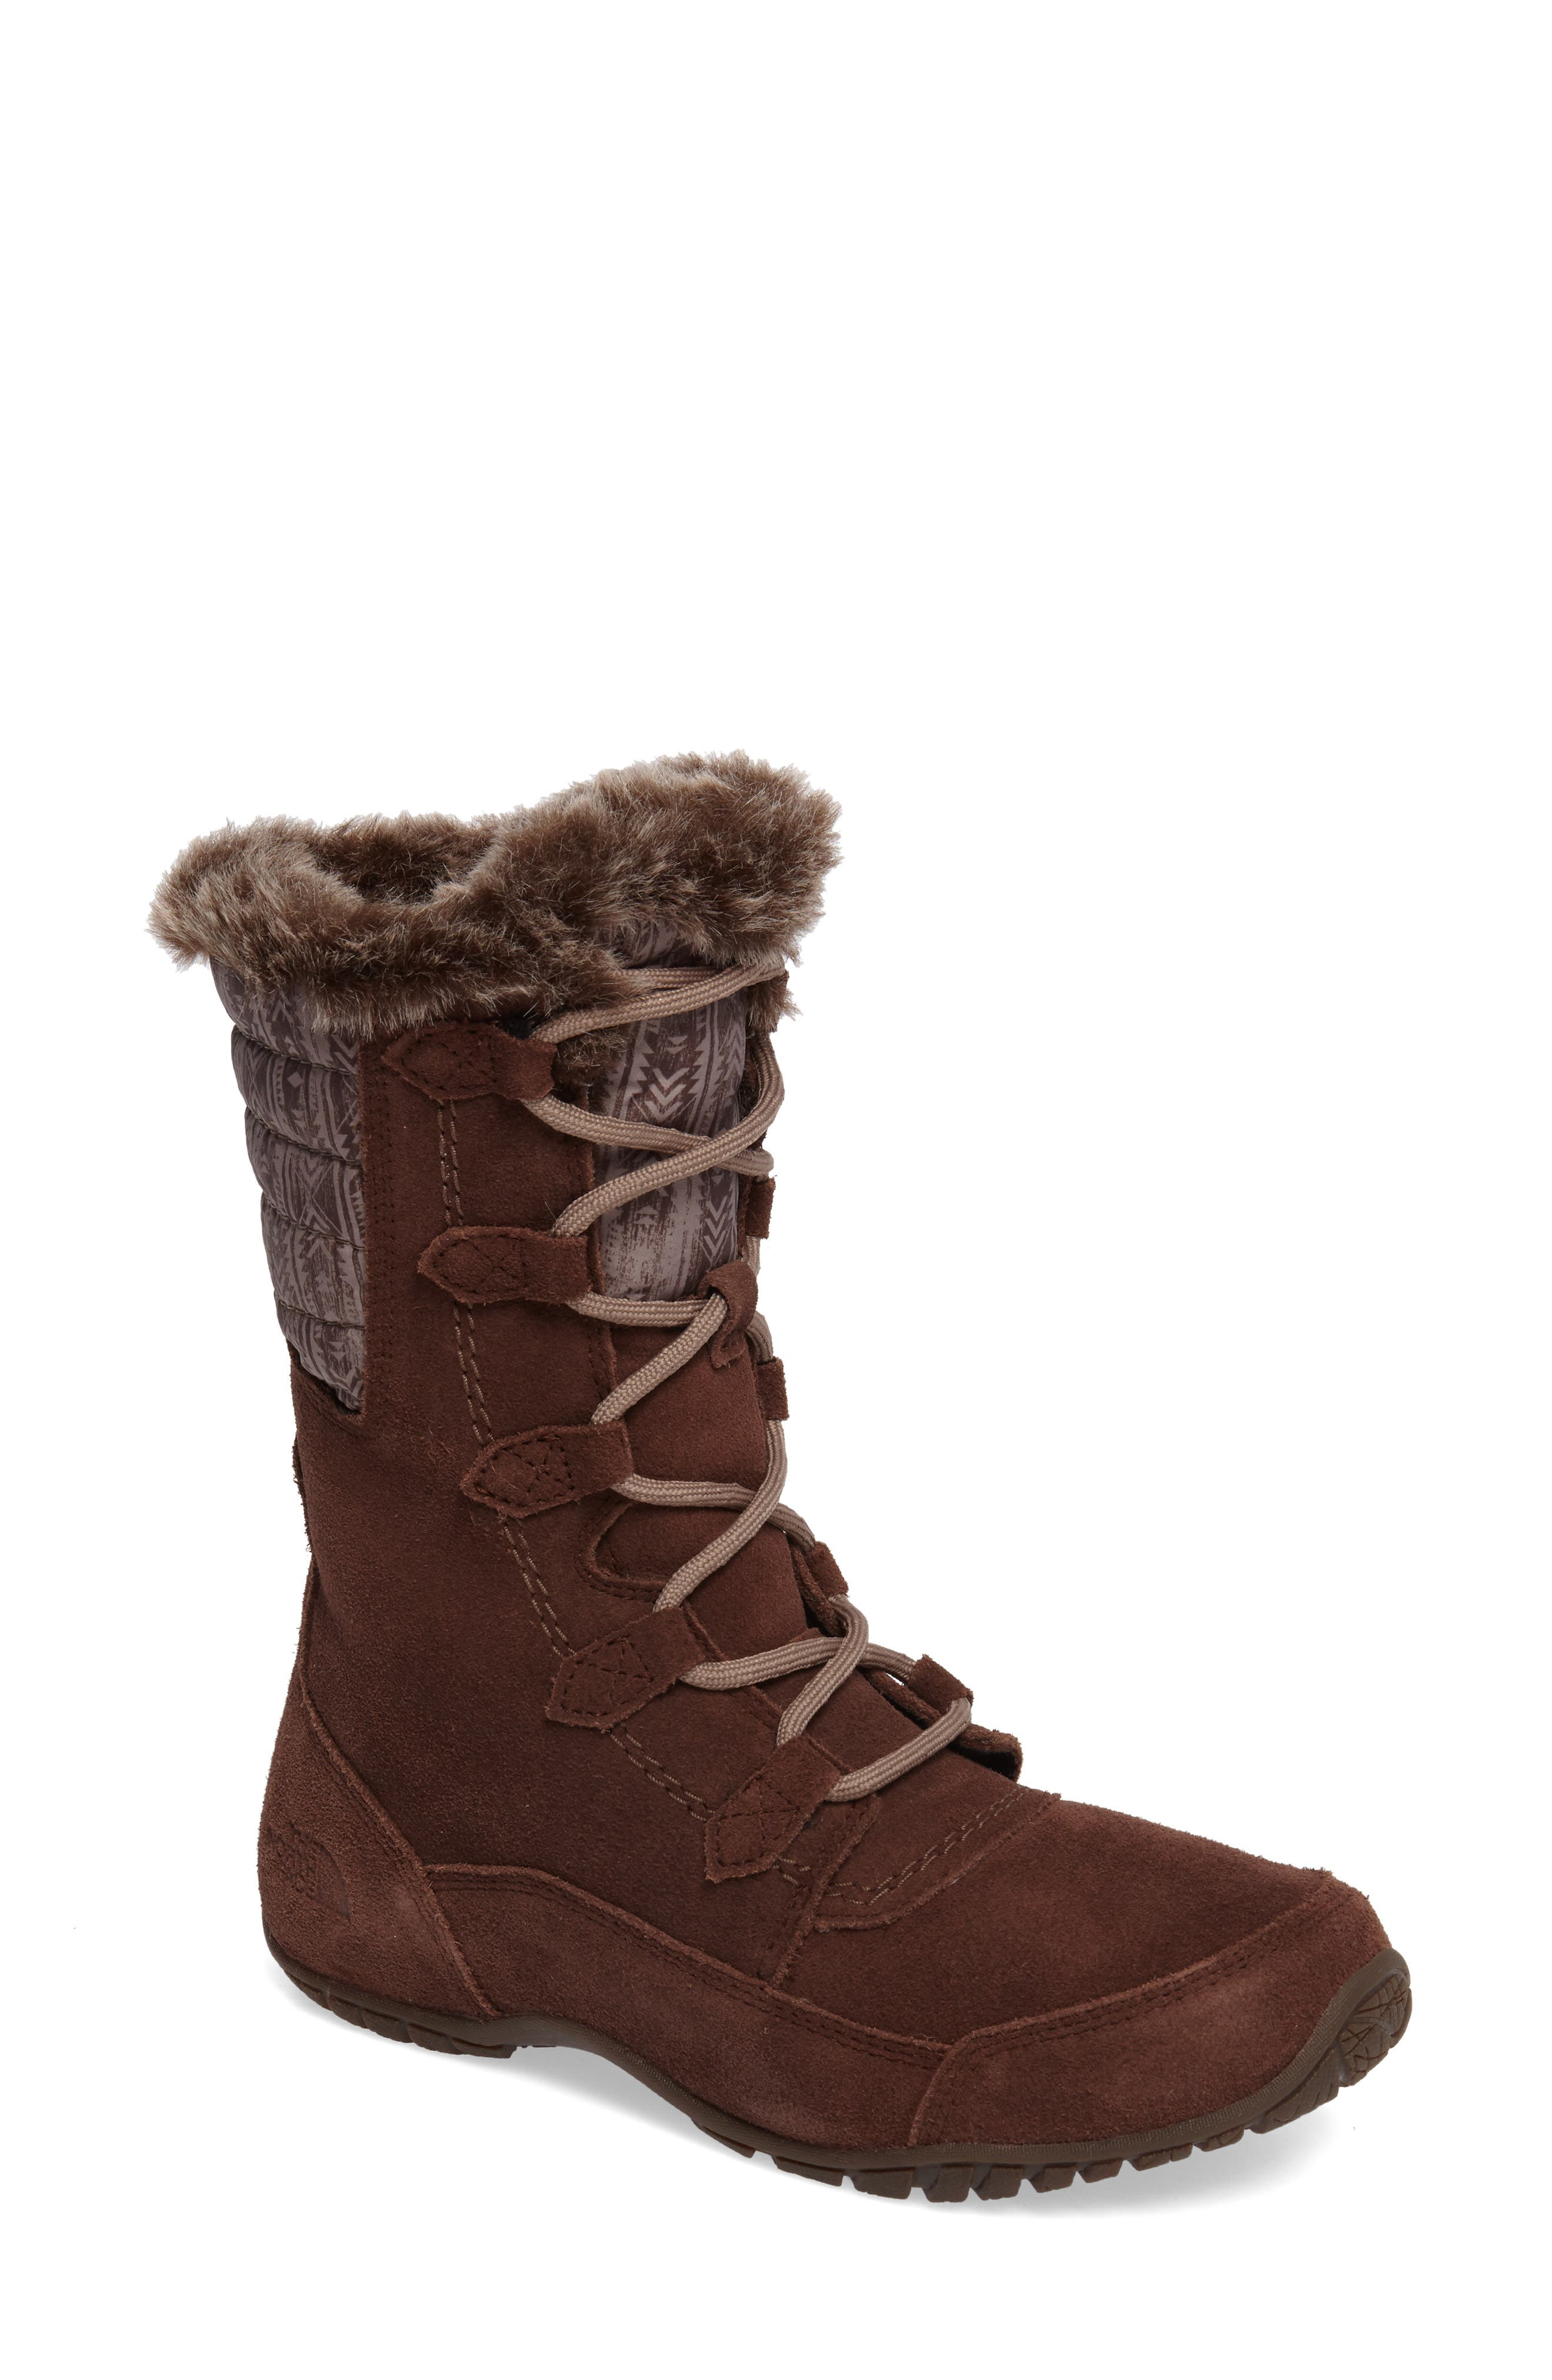 The North Face Nuptse Purna II Waterproof PrimaLoft® Silver Eco Insulated Winter Boot (Women)